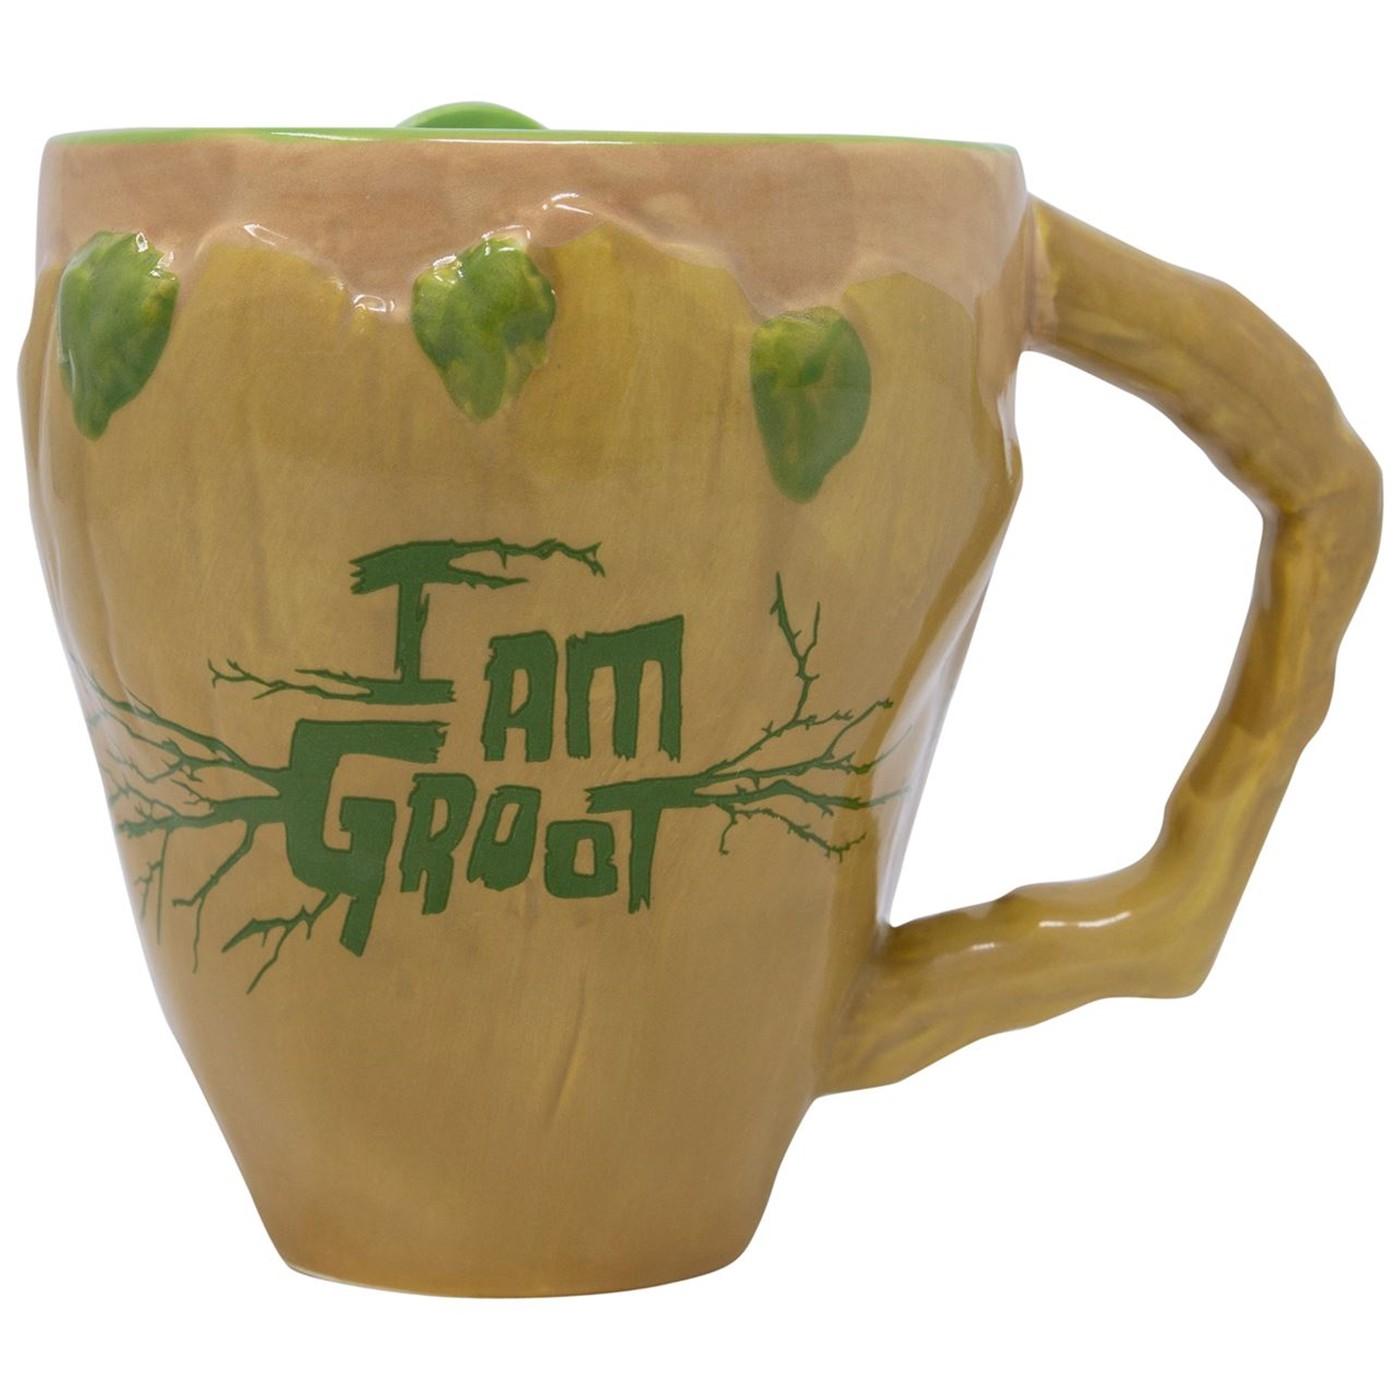 Guardians of the Galaxy Groot Mug